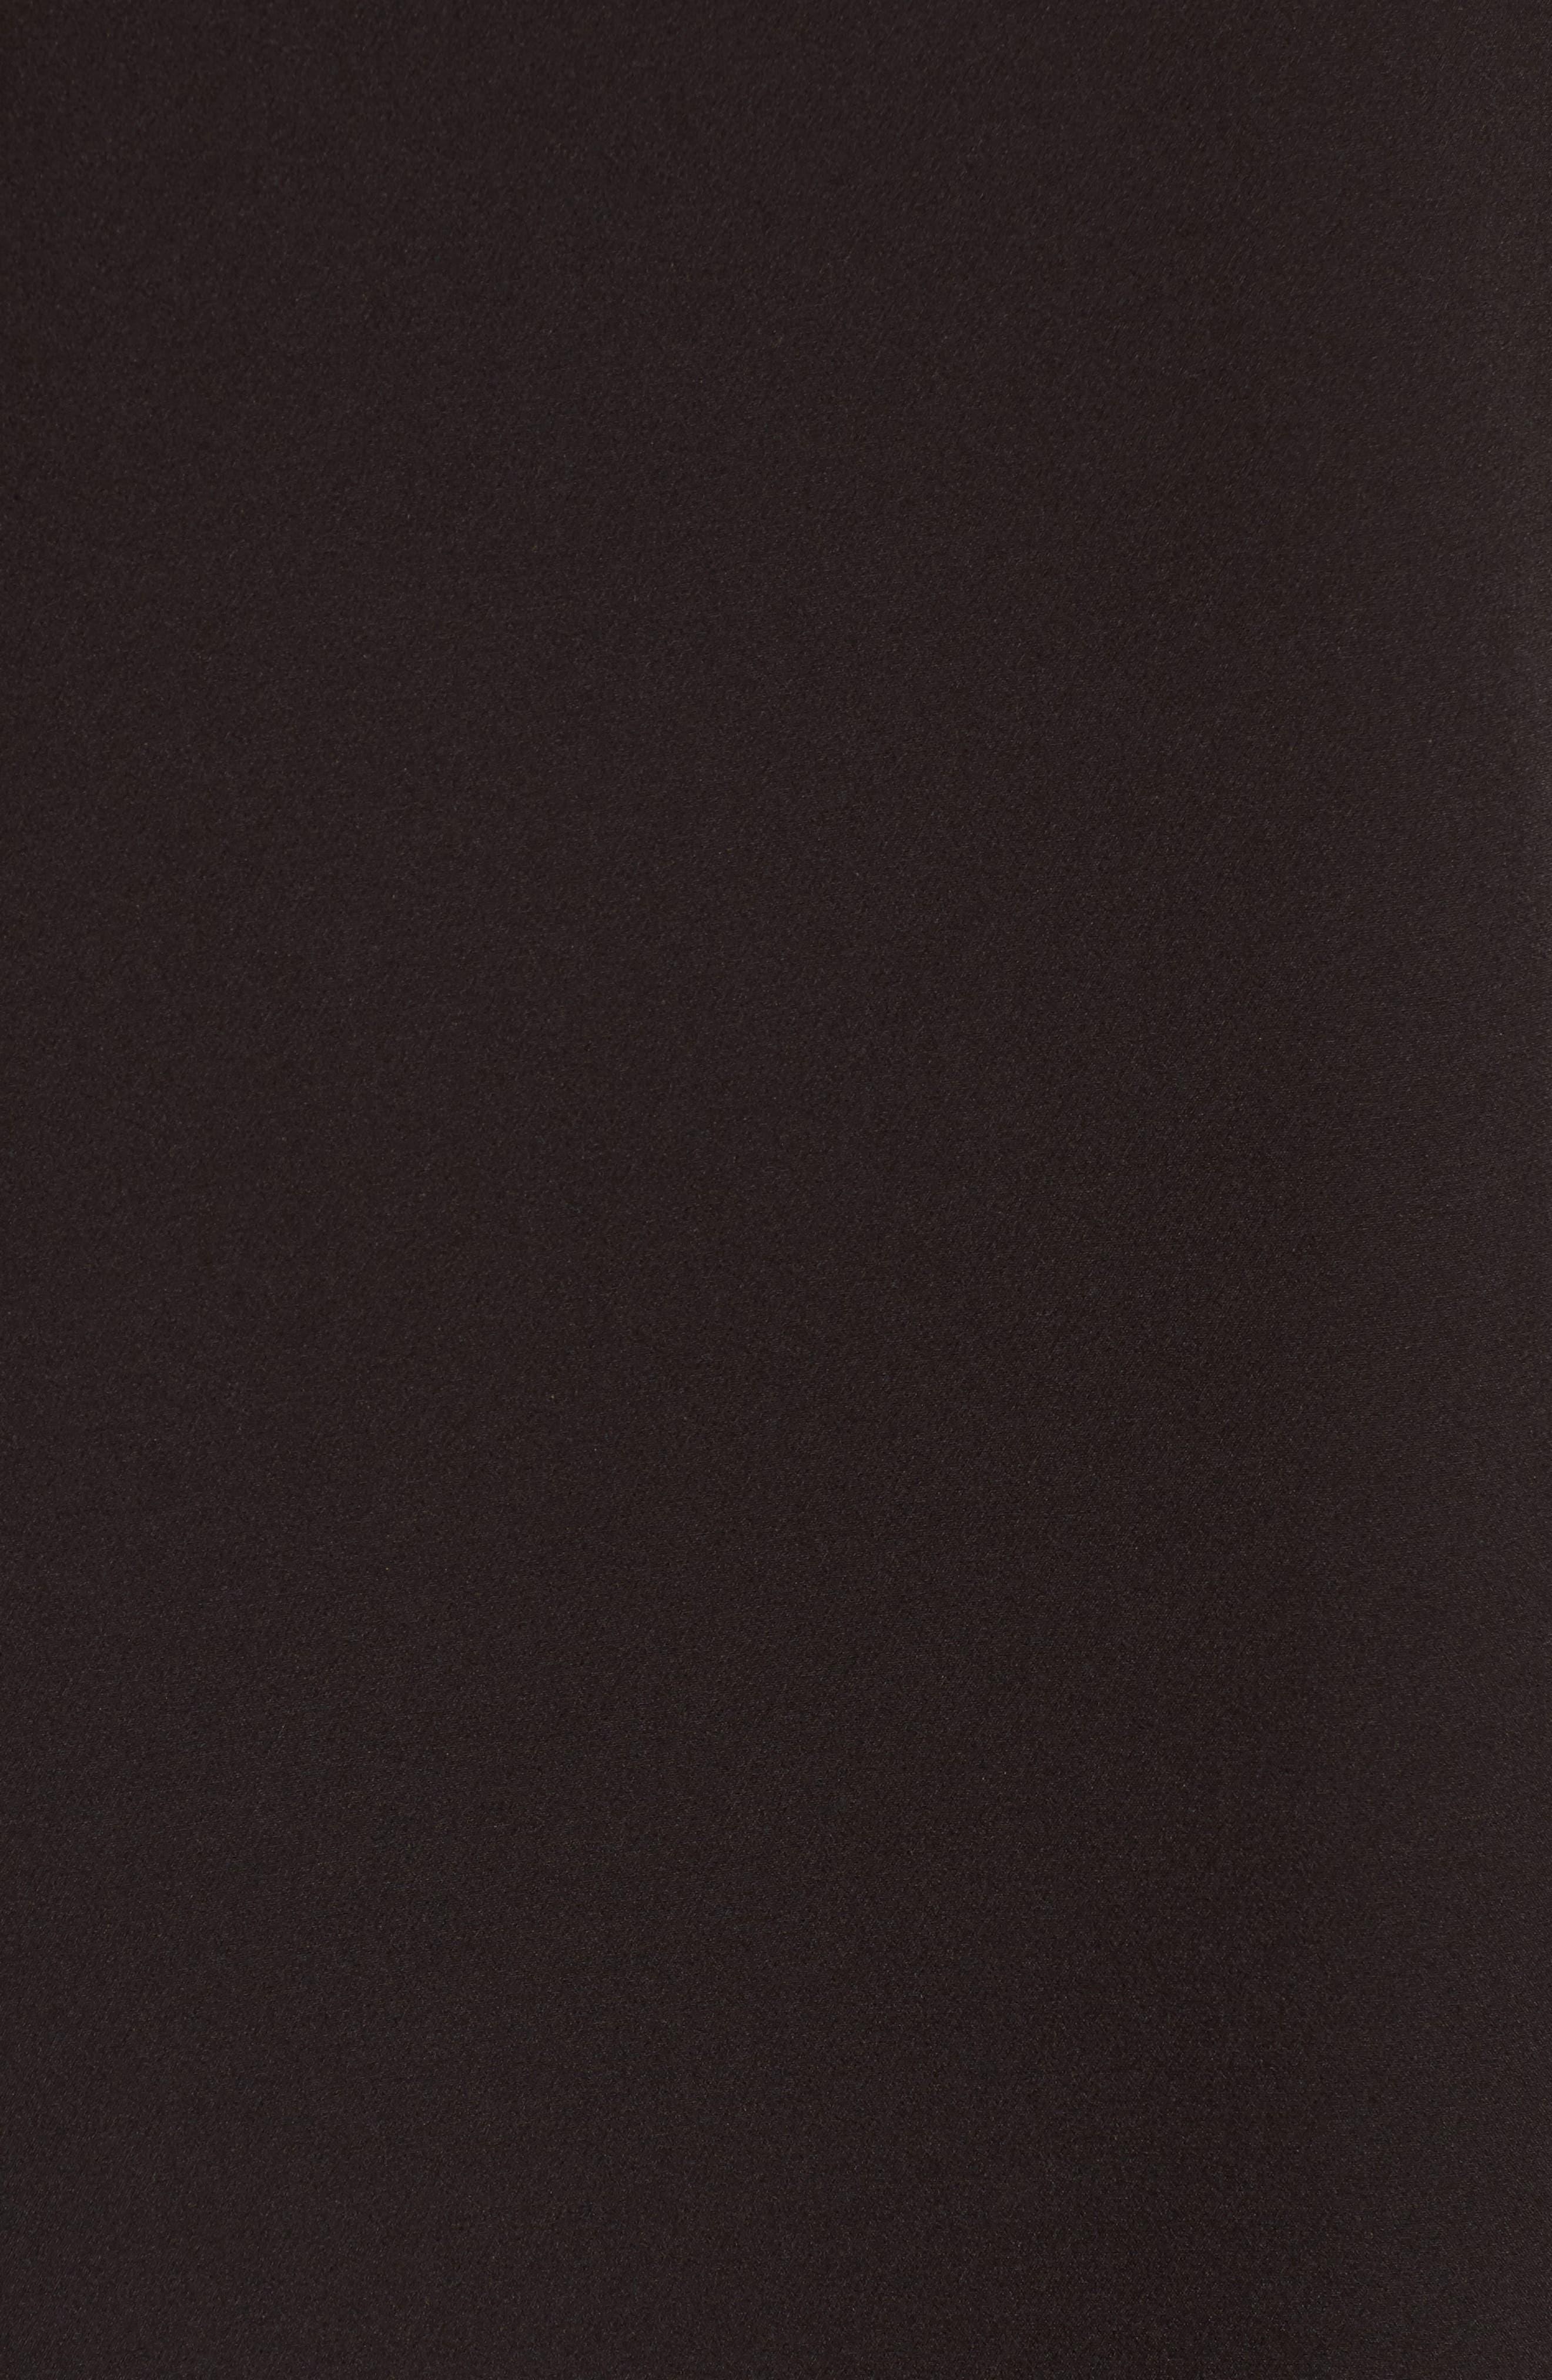 Ruffle Neck Shift Dress,                             Alternate thumbnail 5, color,                             002